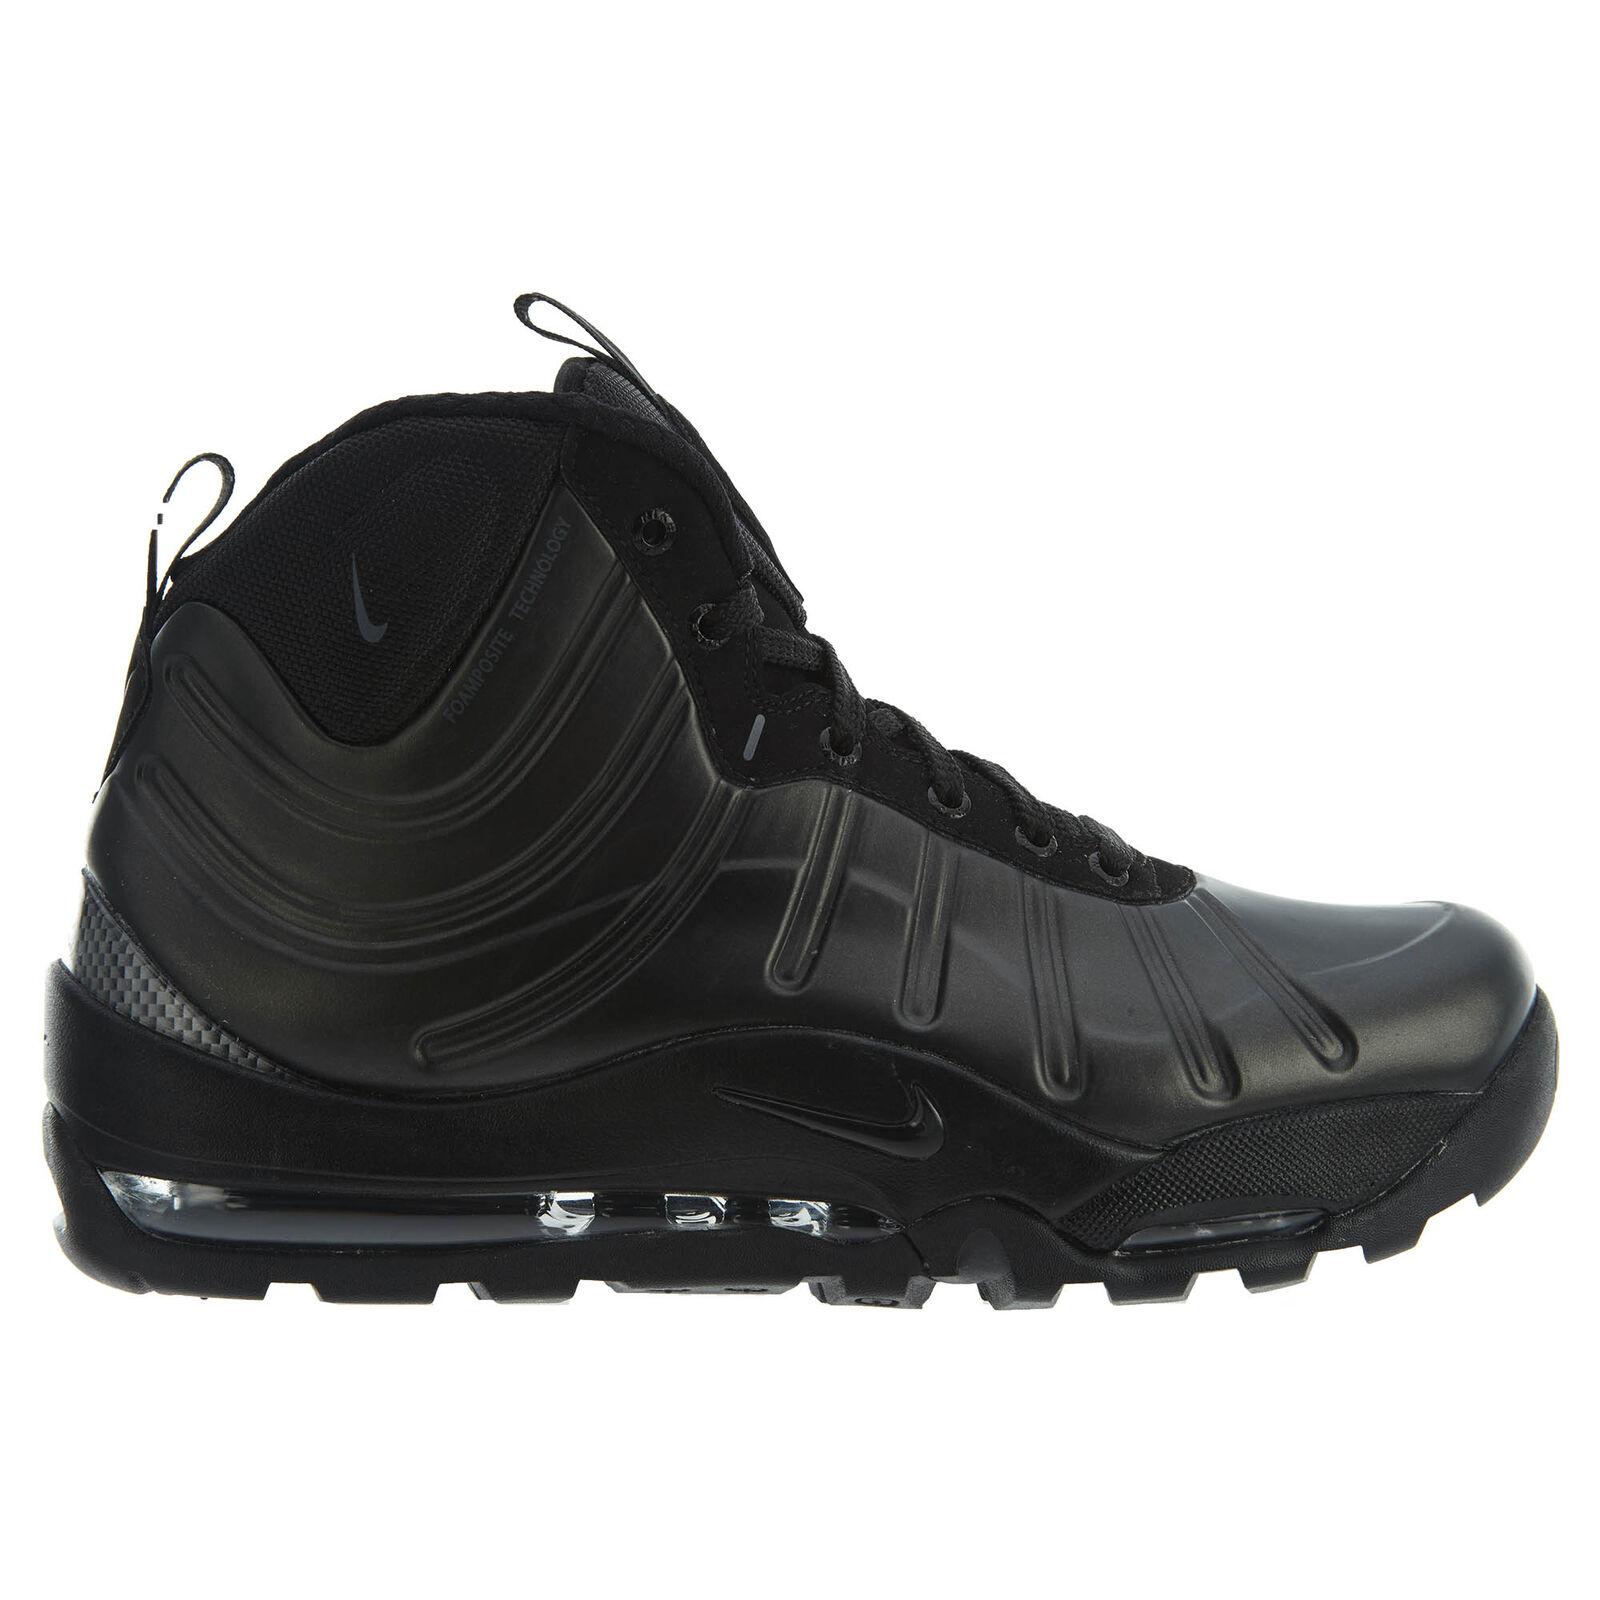 Nike Air Bakin' Posite Mens 618056-001 Black Foamposite Sneakerboots Size 8